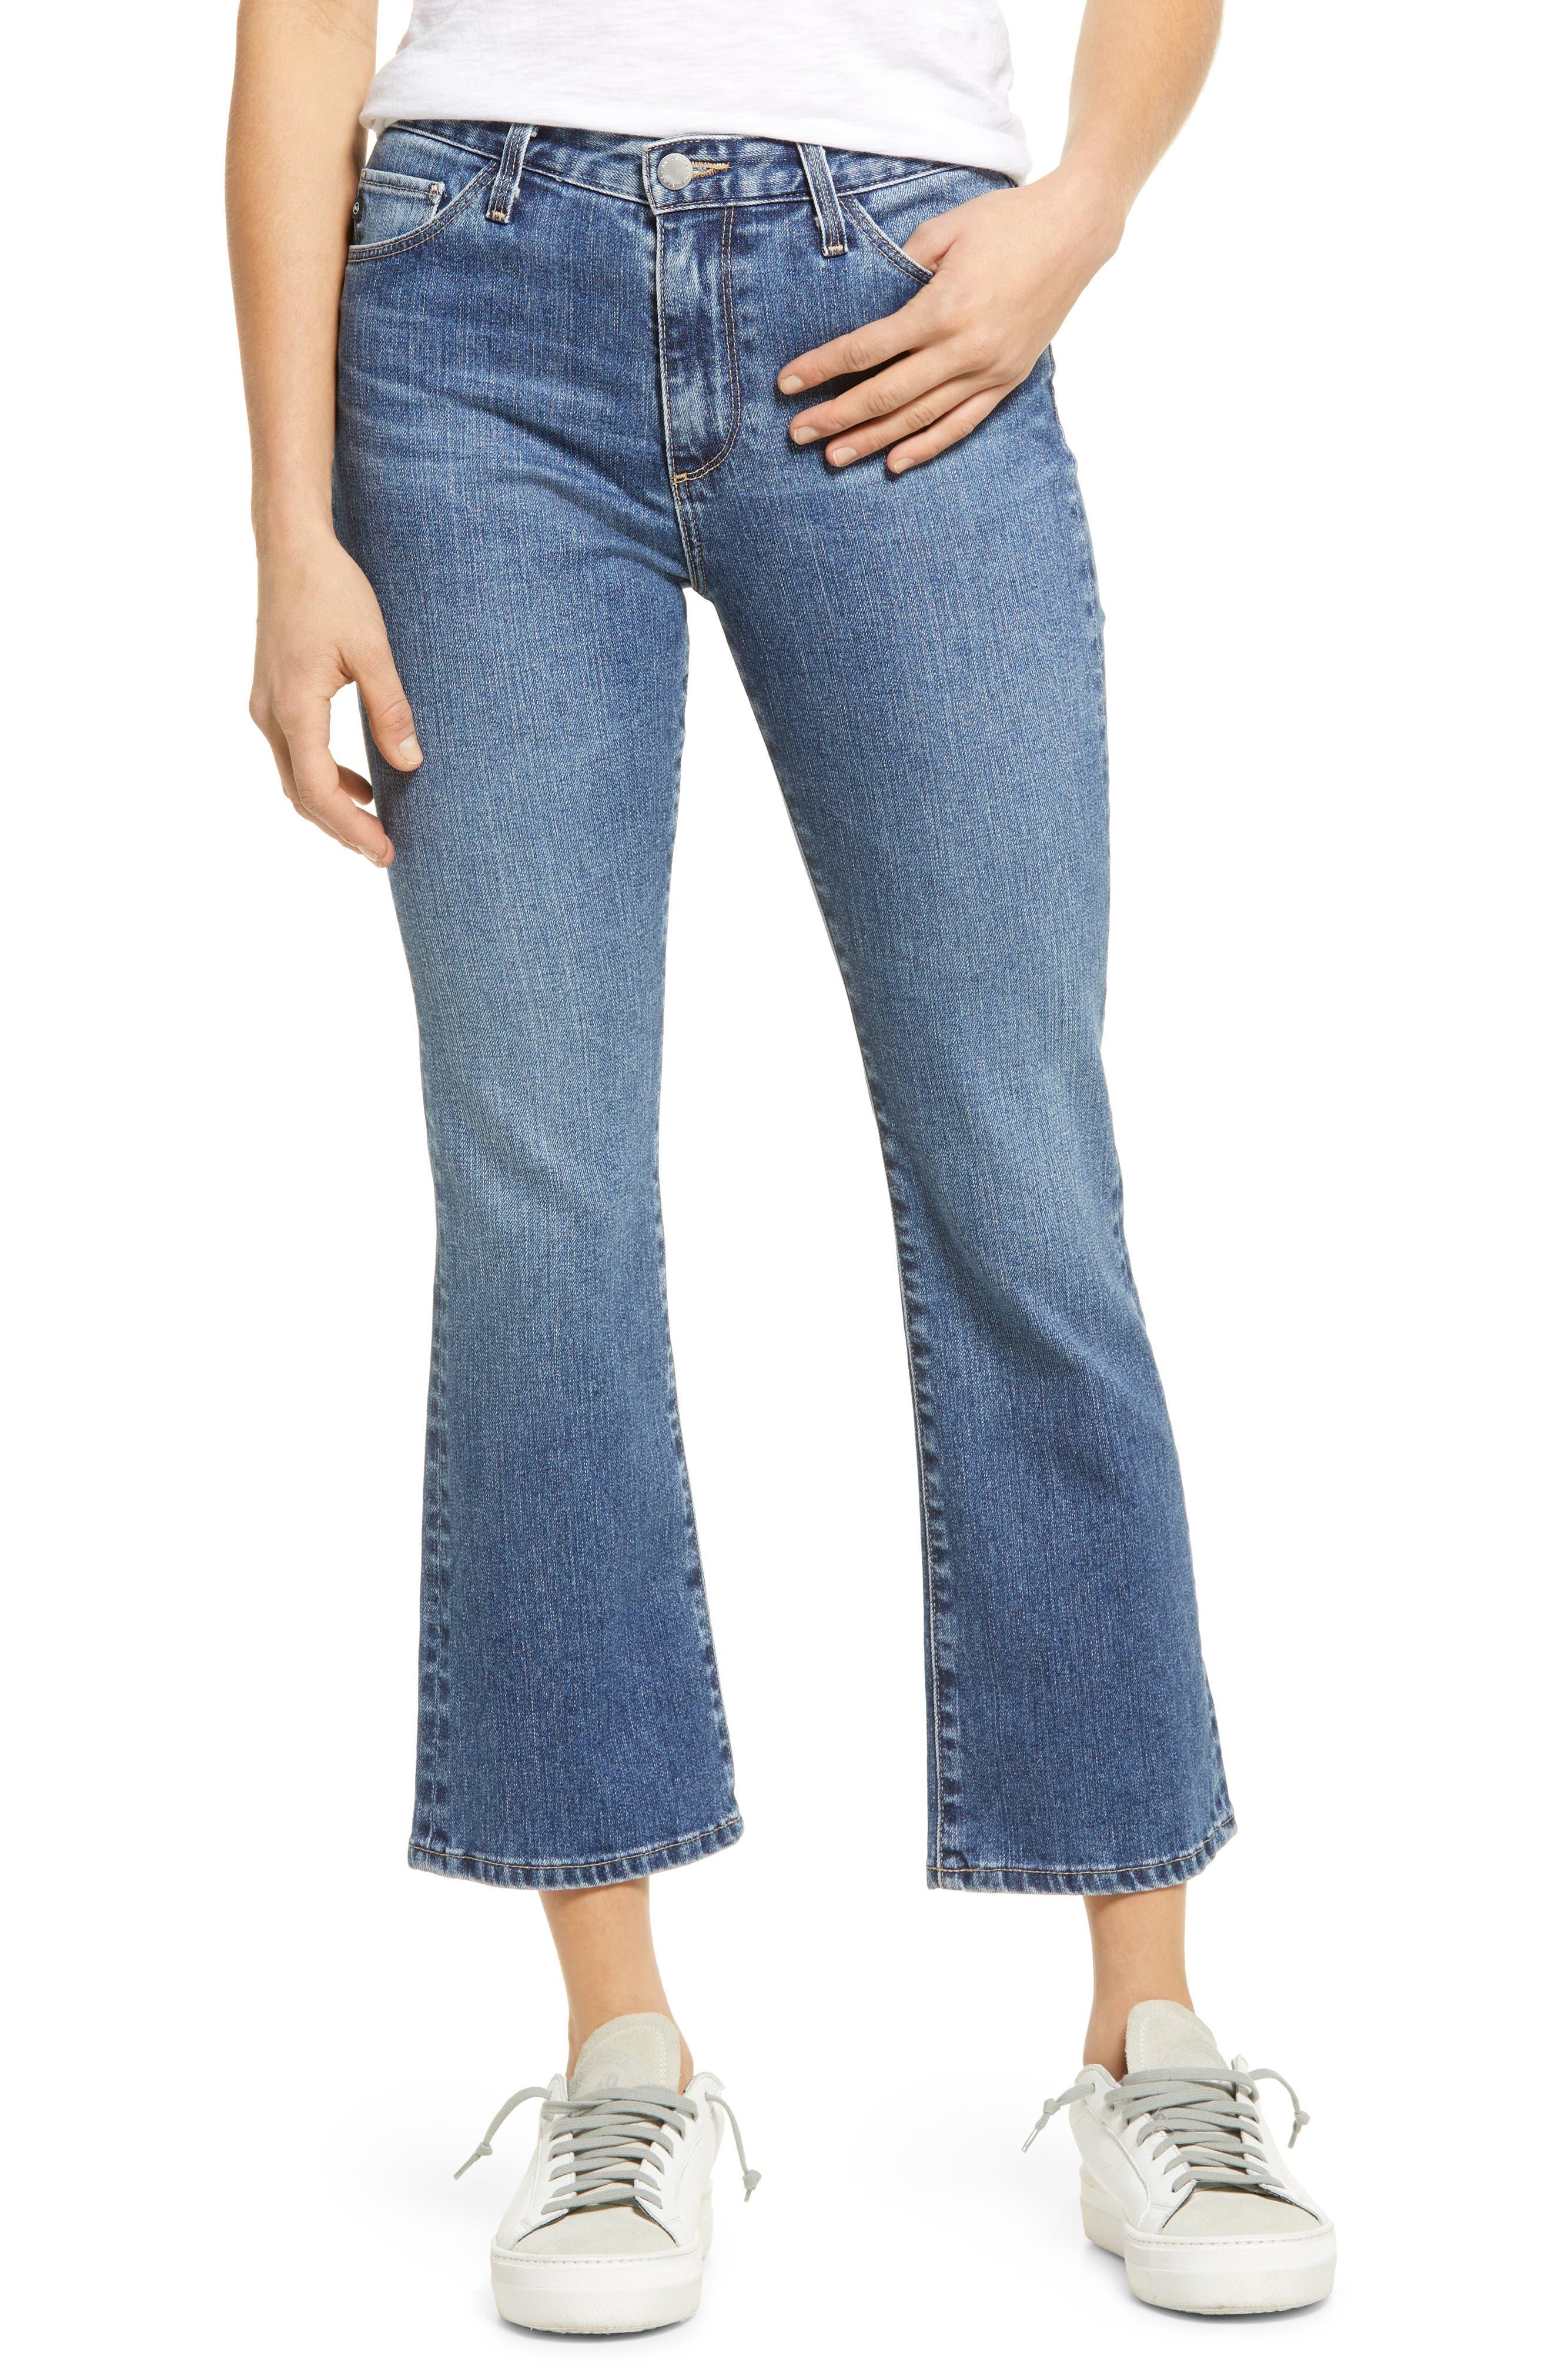 Jeans Jodi Ripped Crop Flare Jeans